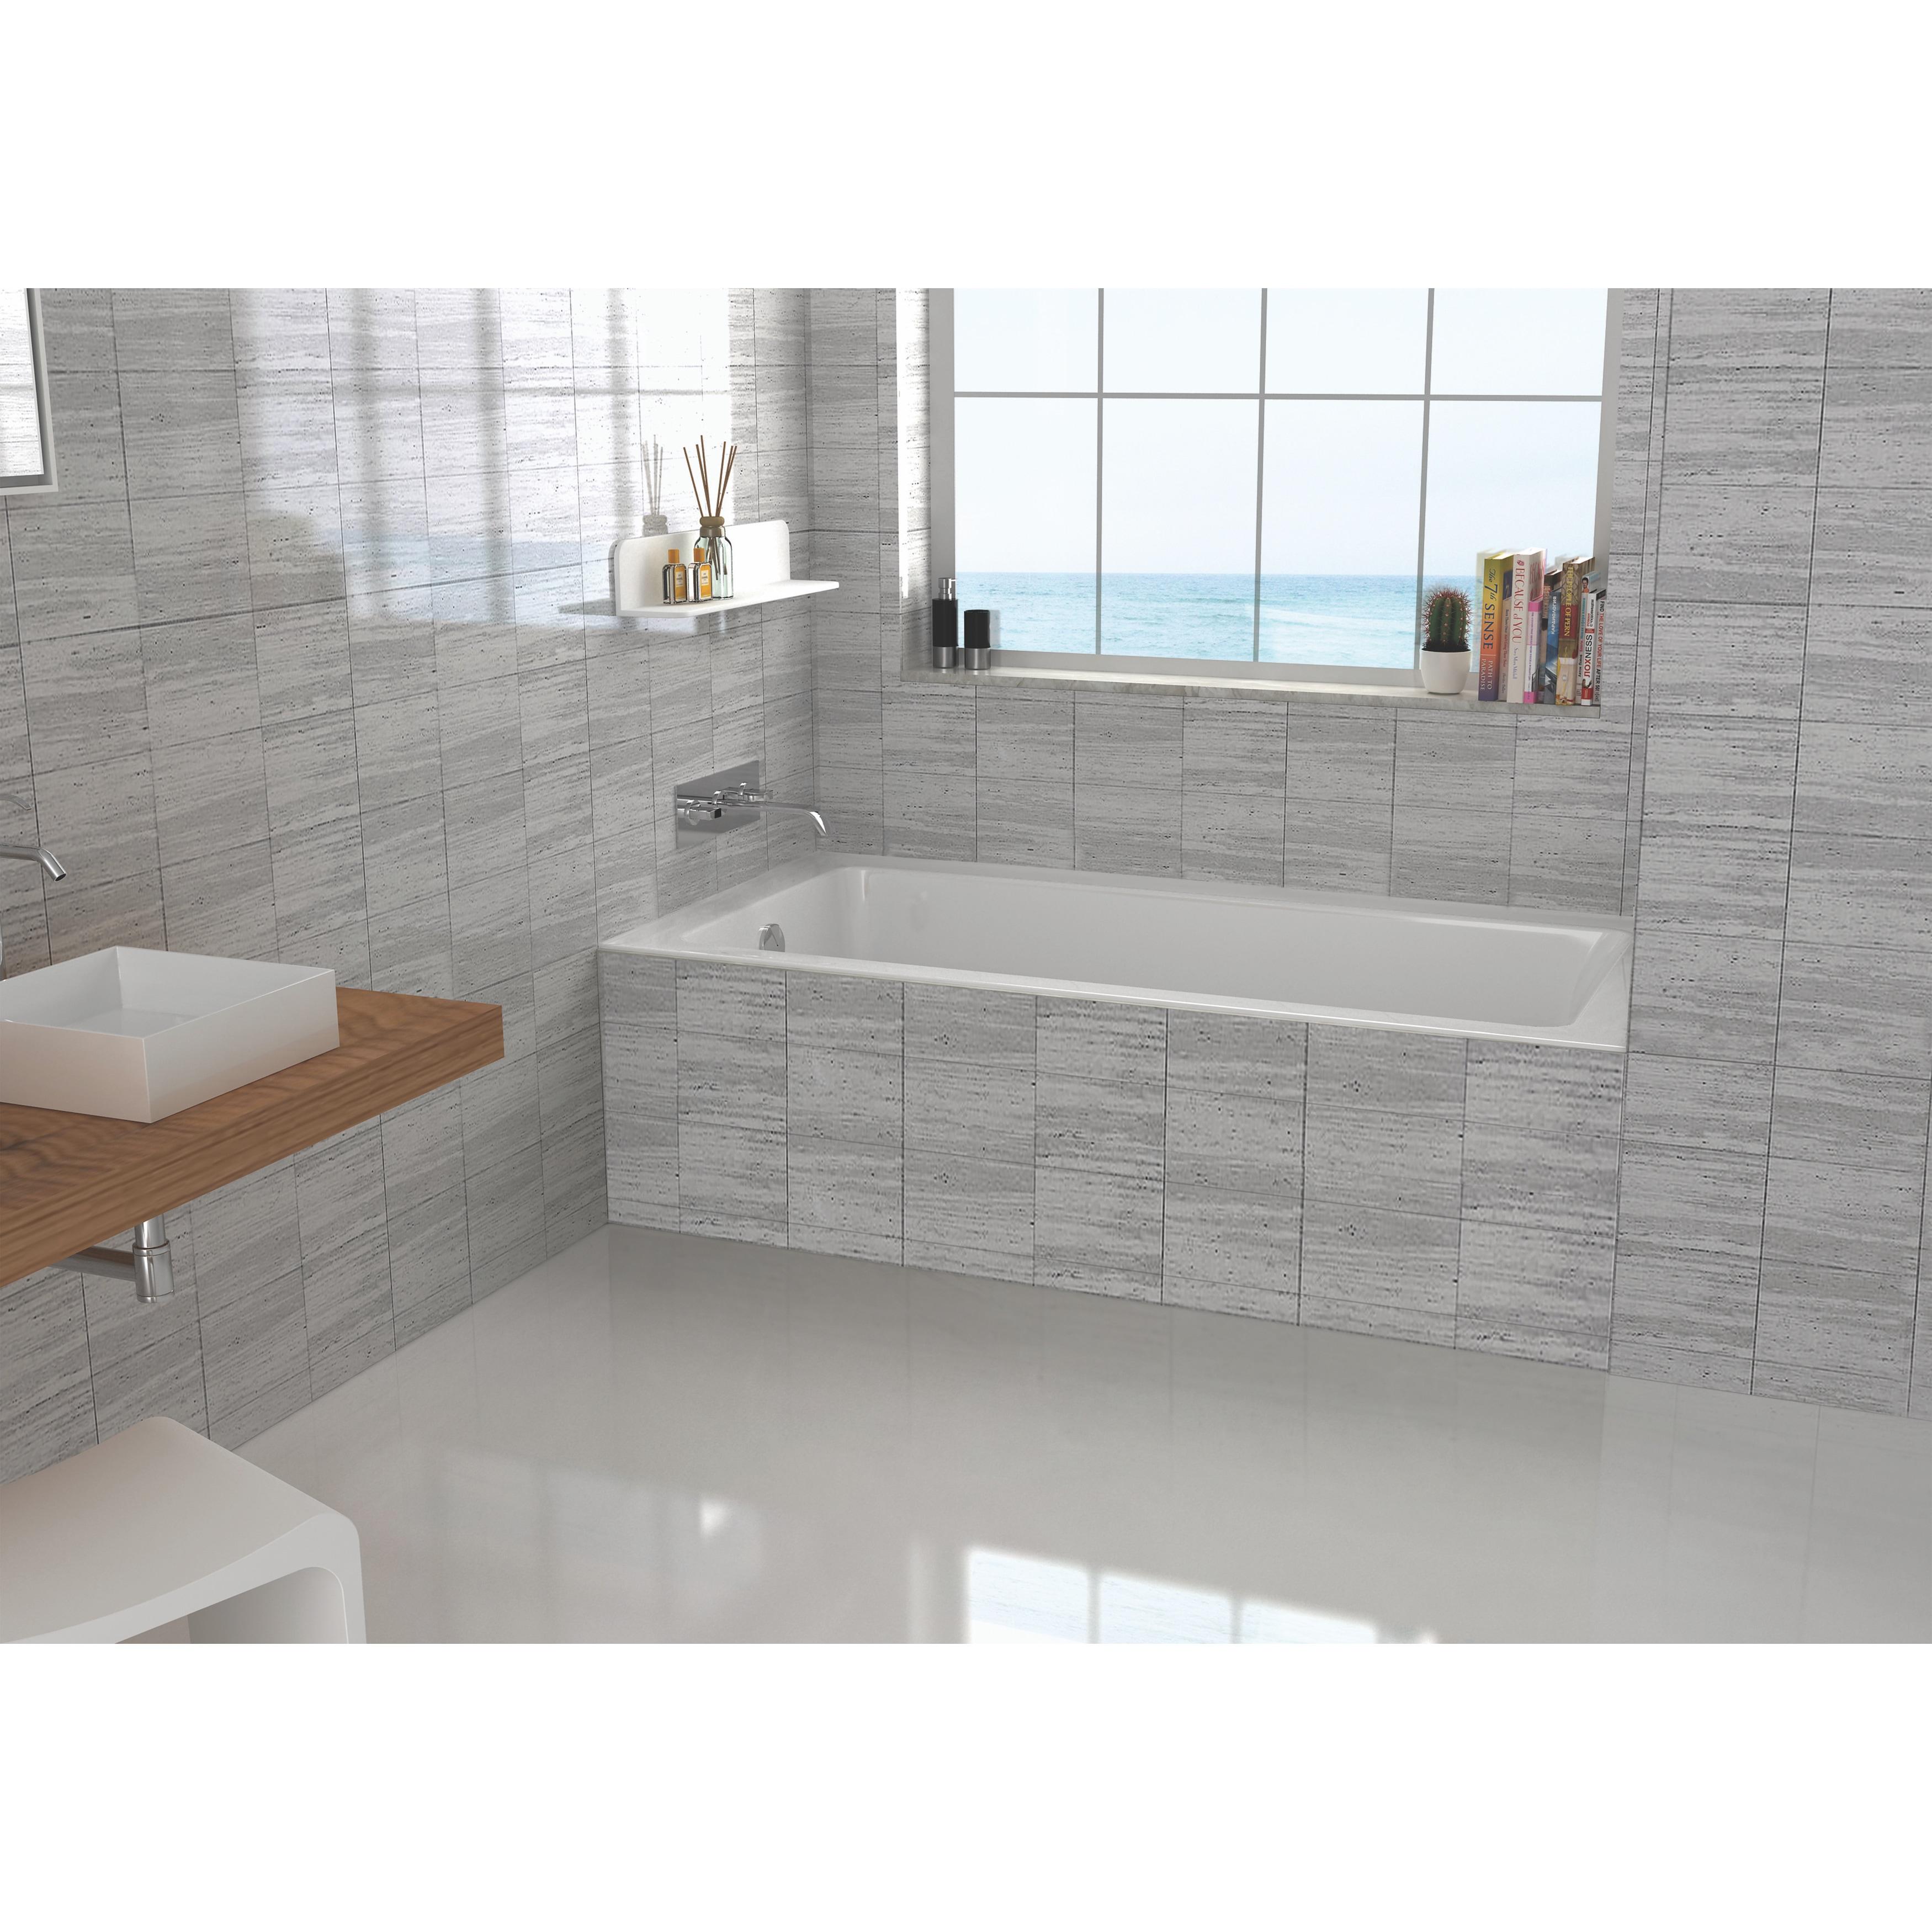 Shop Left-side Fixed Grey Tile Flange Alcove Bathtub (32\